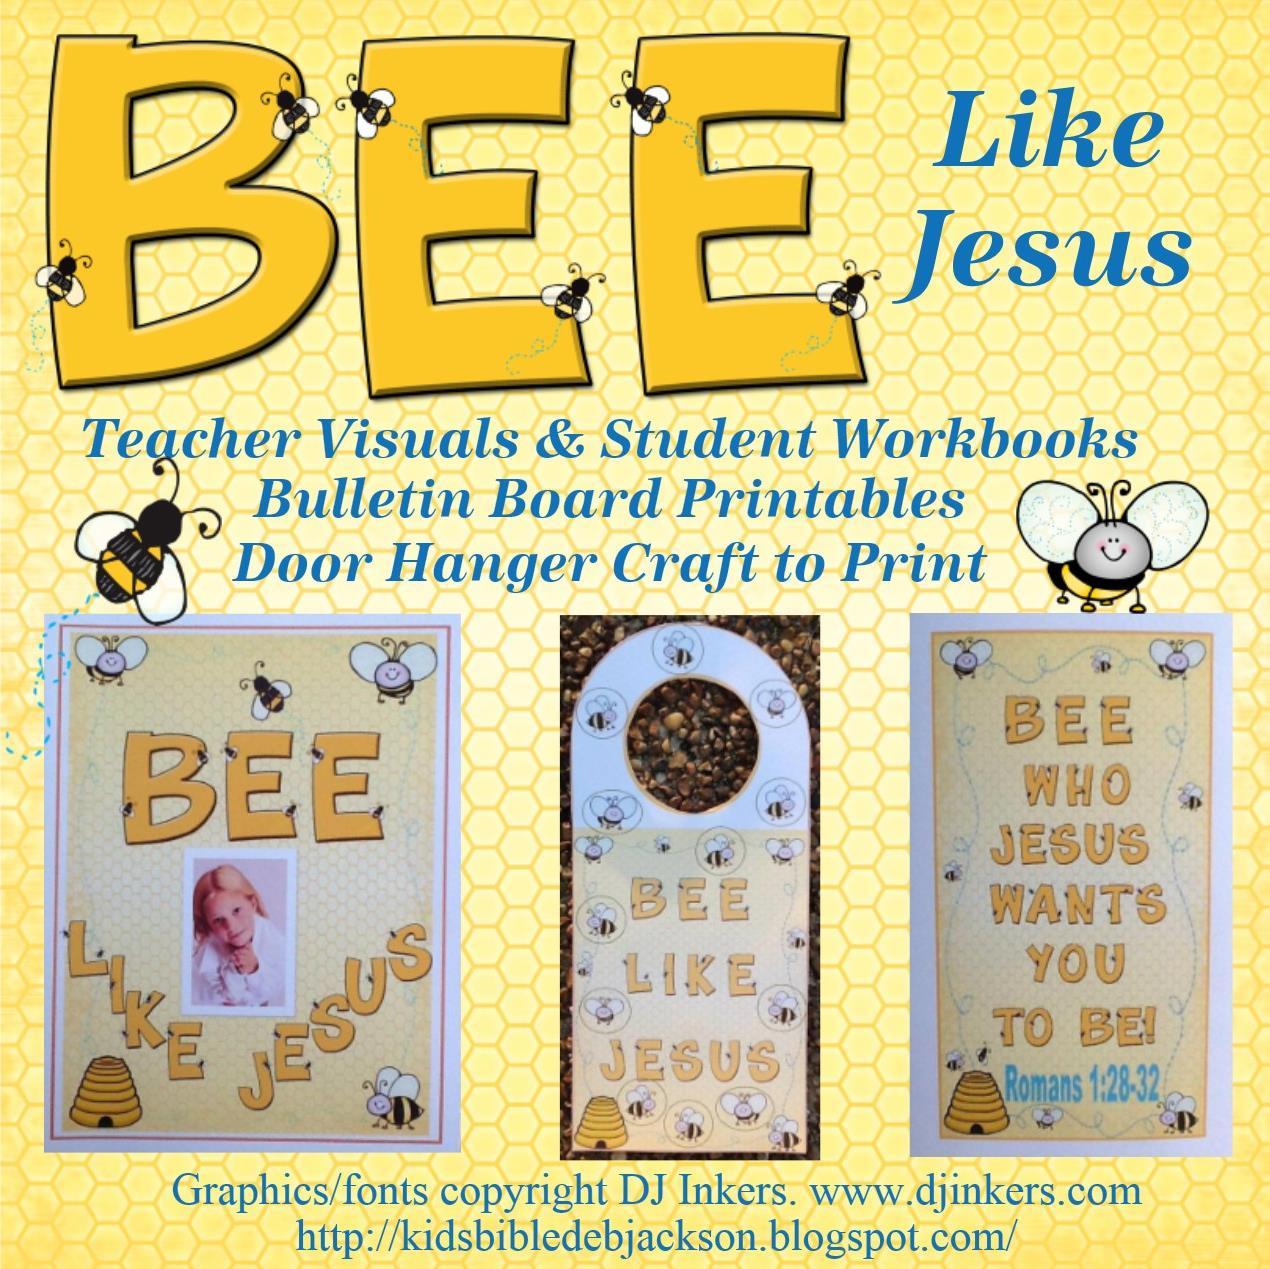 http://kidsbibledebjackson.blogspot.com/2013/07/31-romans-bee-who-jesus-wants-you-to.html